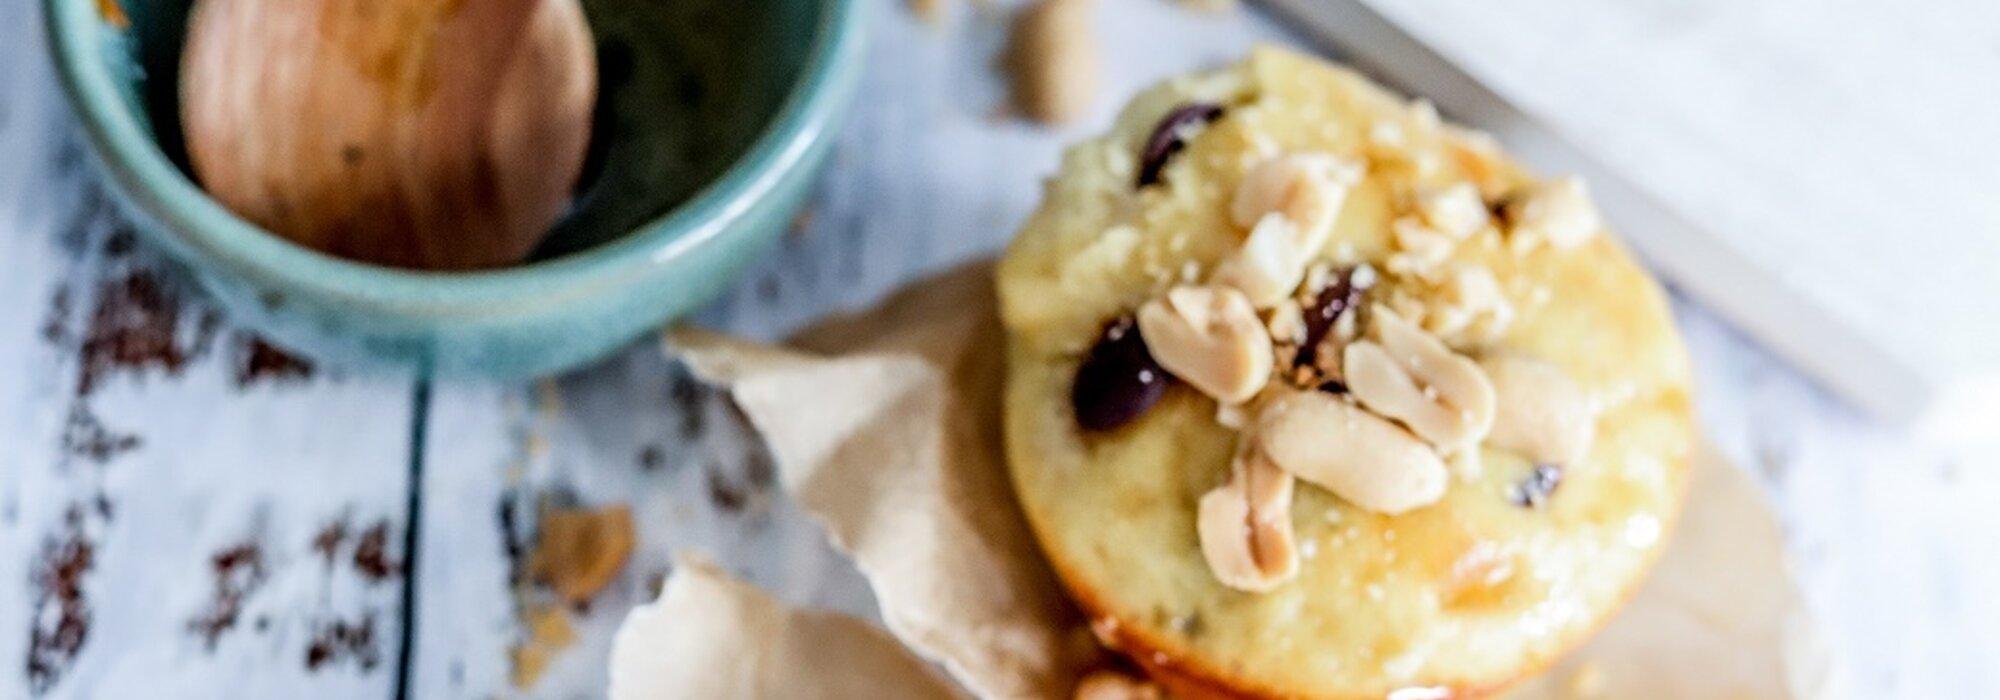 Koolhydraatarme Snicker muffins